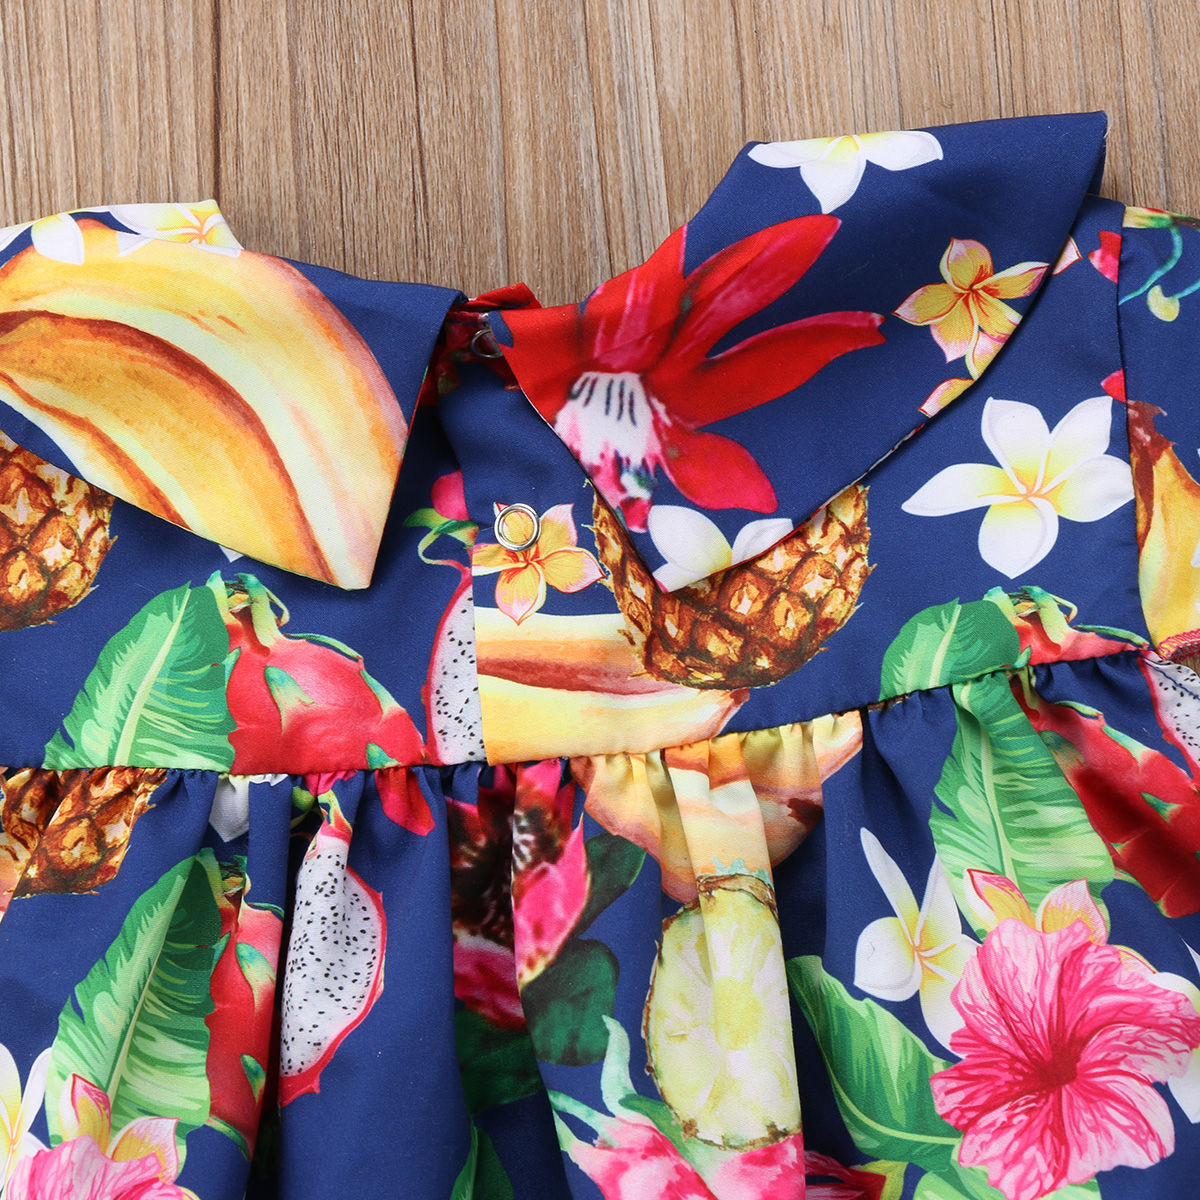 Dress Outfits-Clothes Shorts Headband Newborn Baby-Girl Infant Summer Tutu Bloomer Fruit